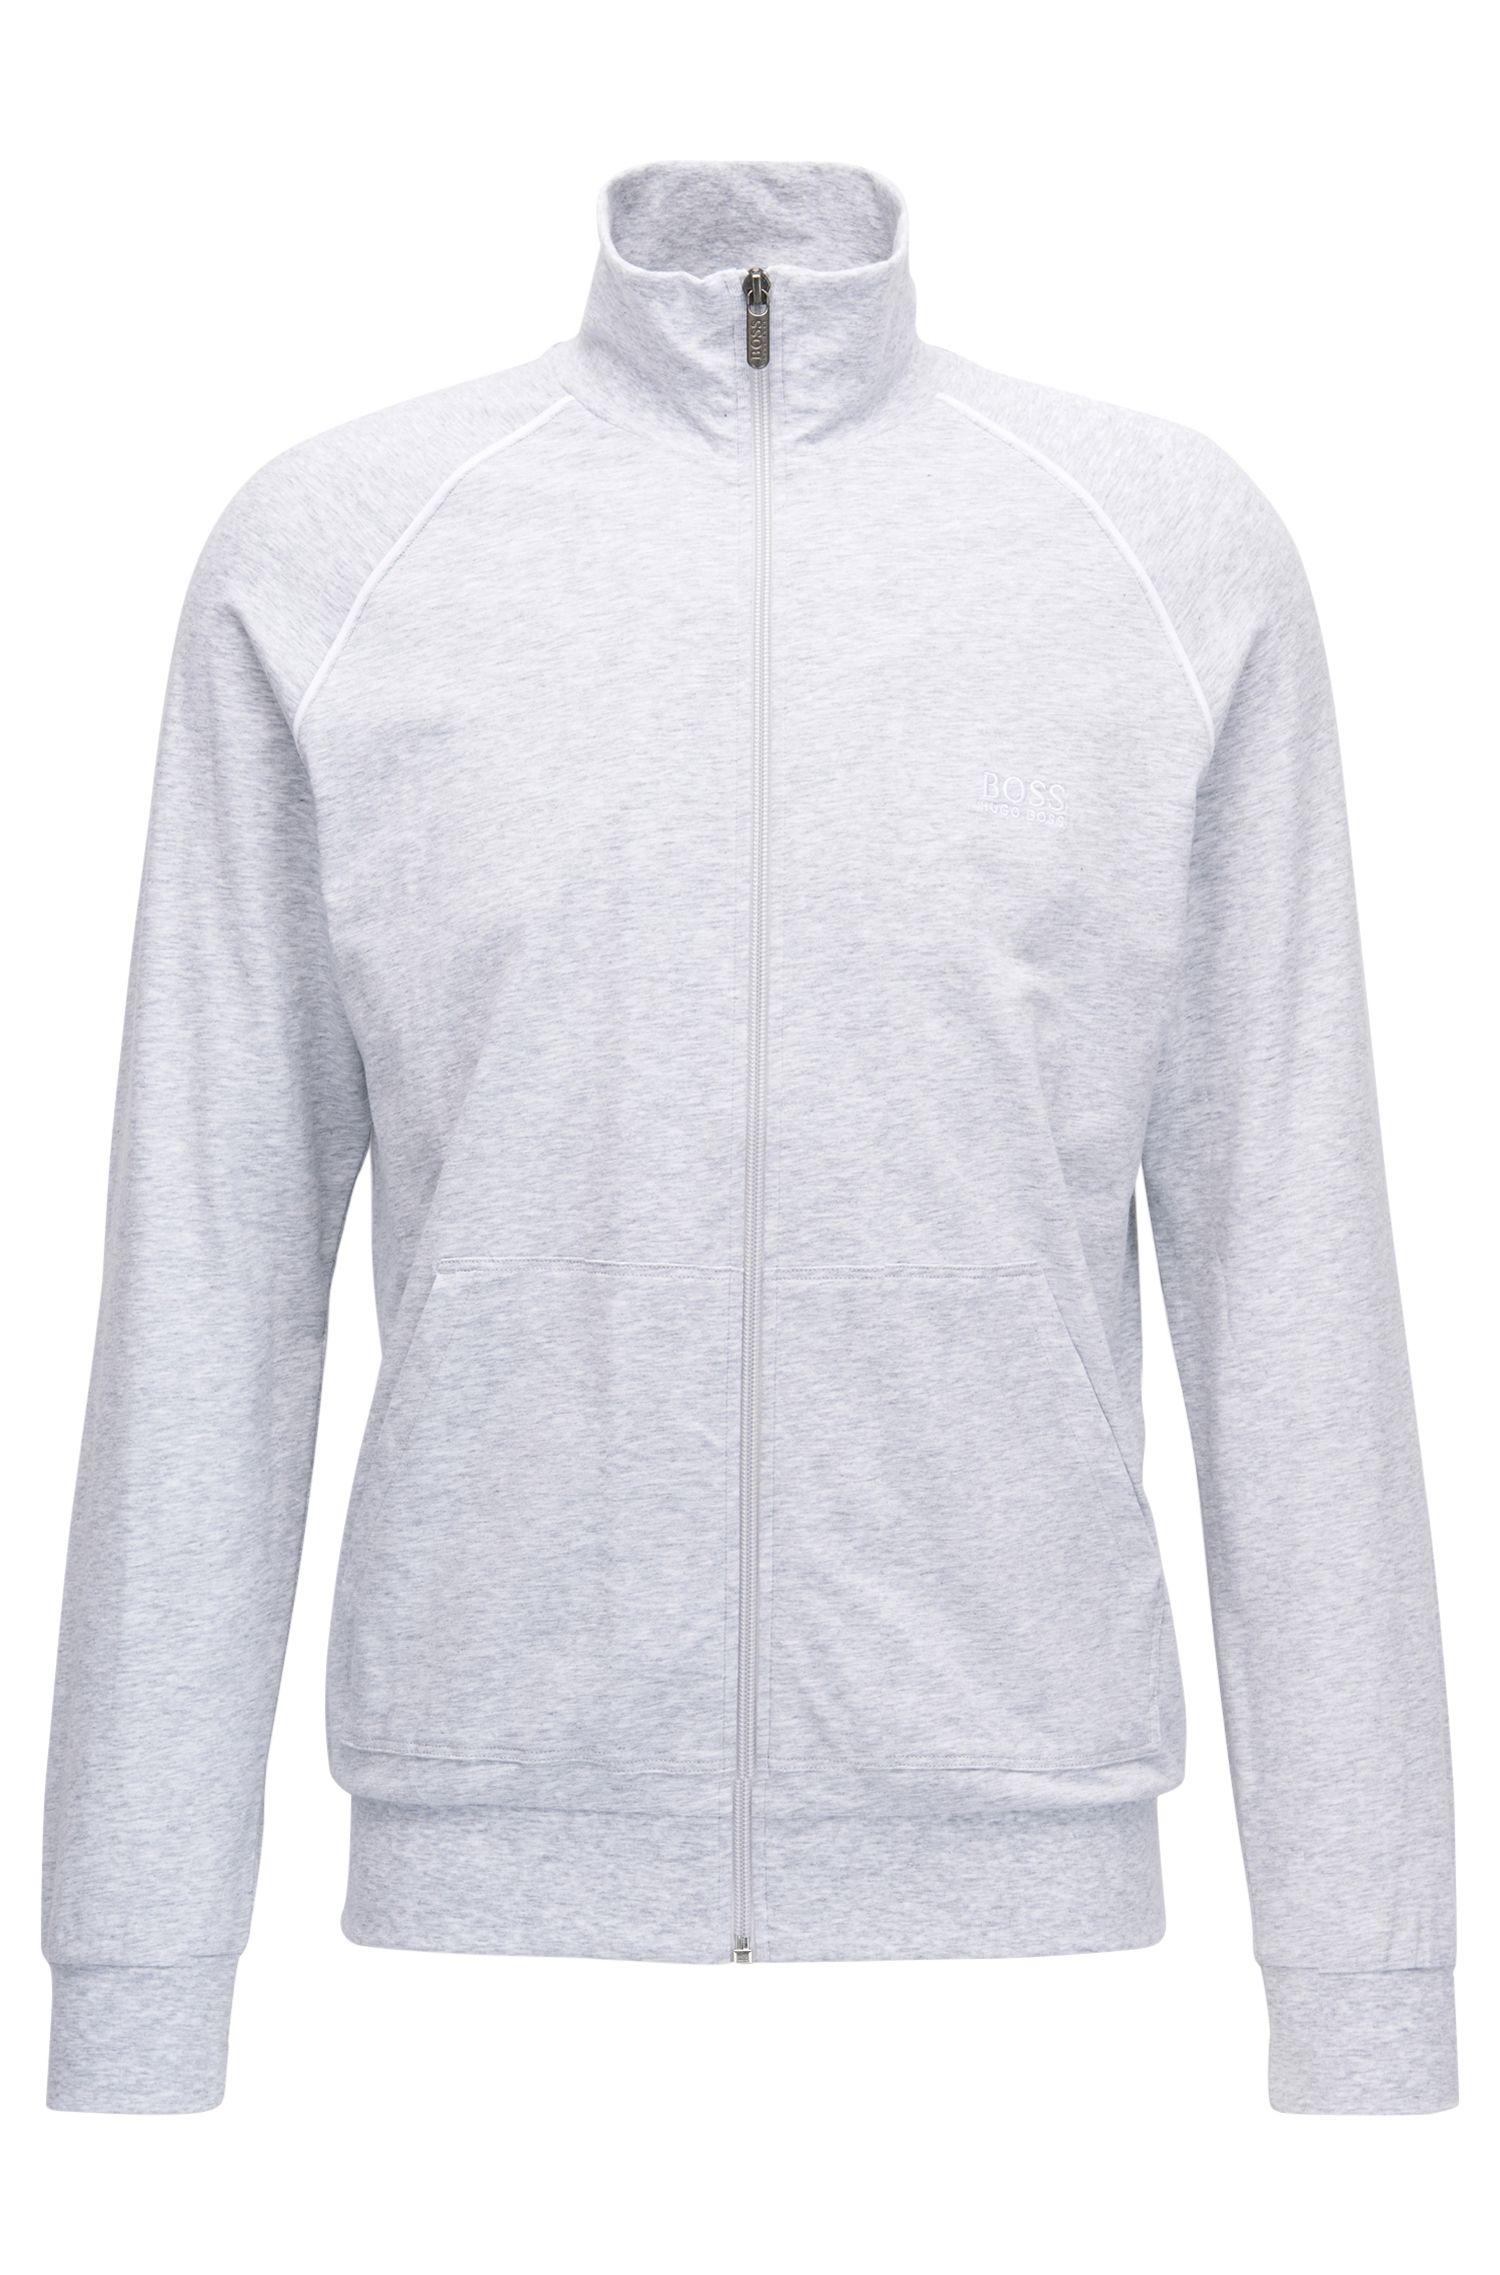 Regular-fit loungewear jacket in stretch cotton